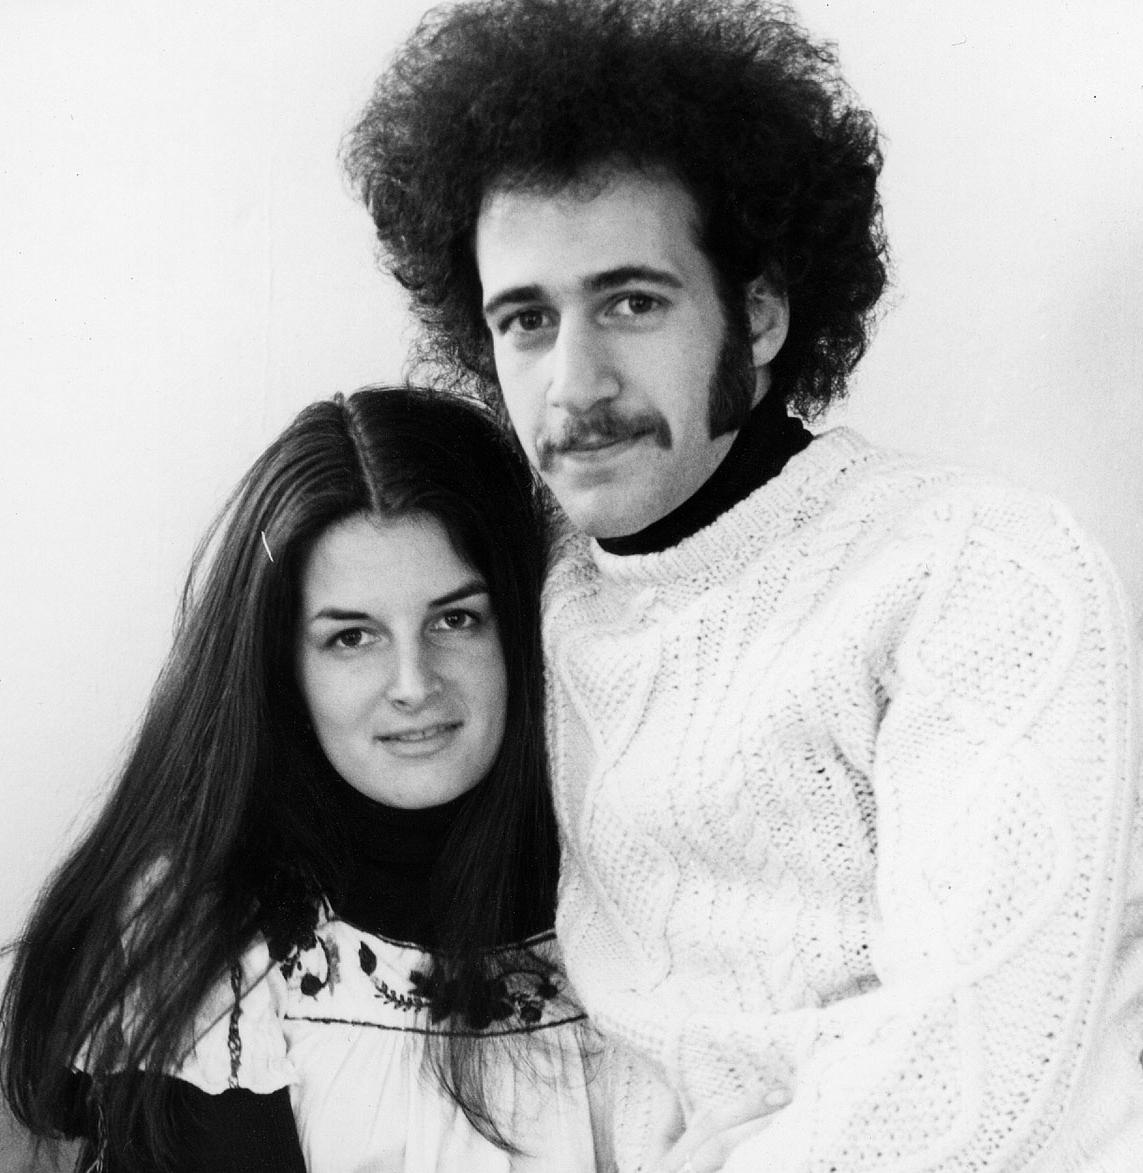 Liza and Rob, circa 1973